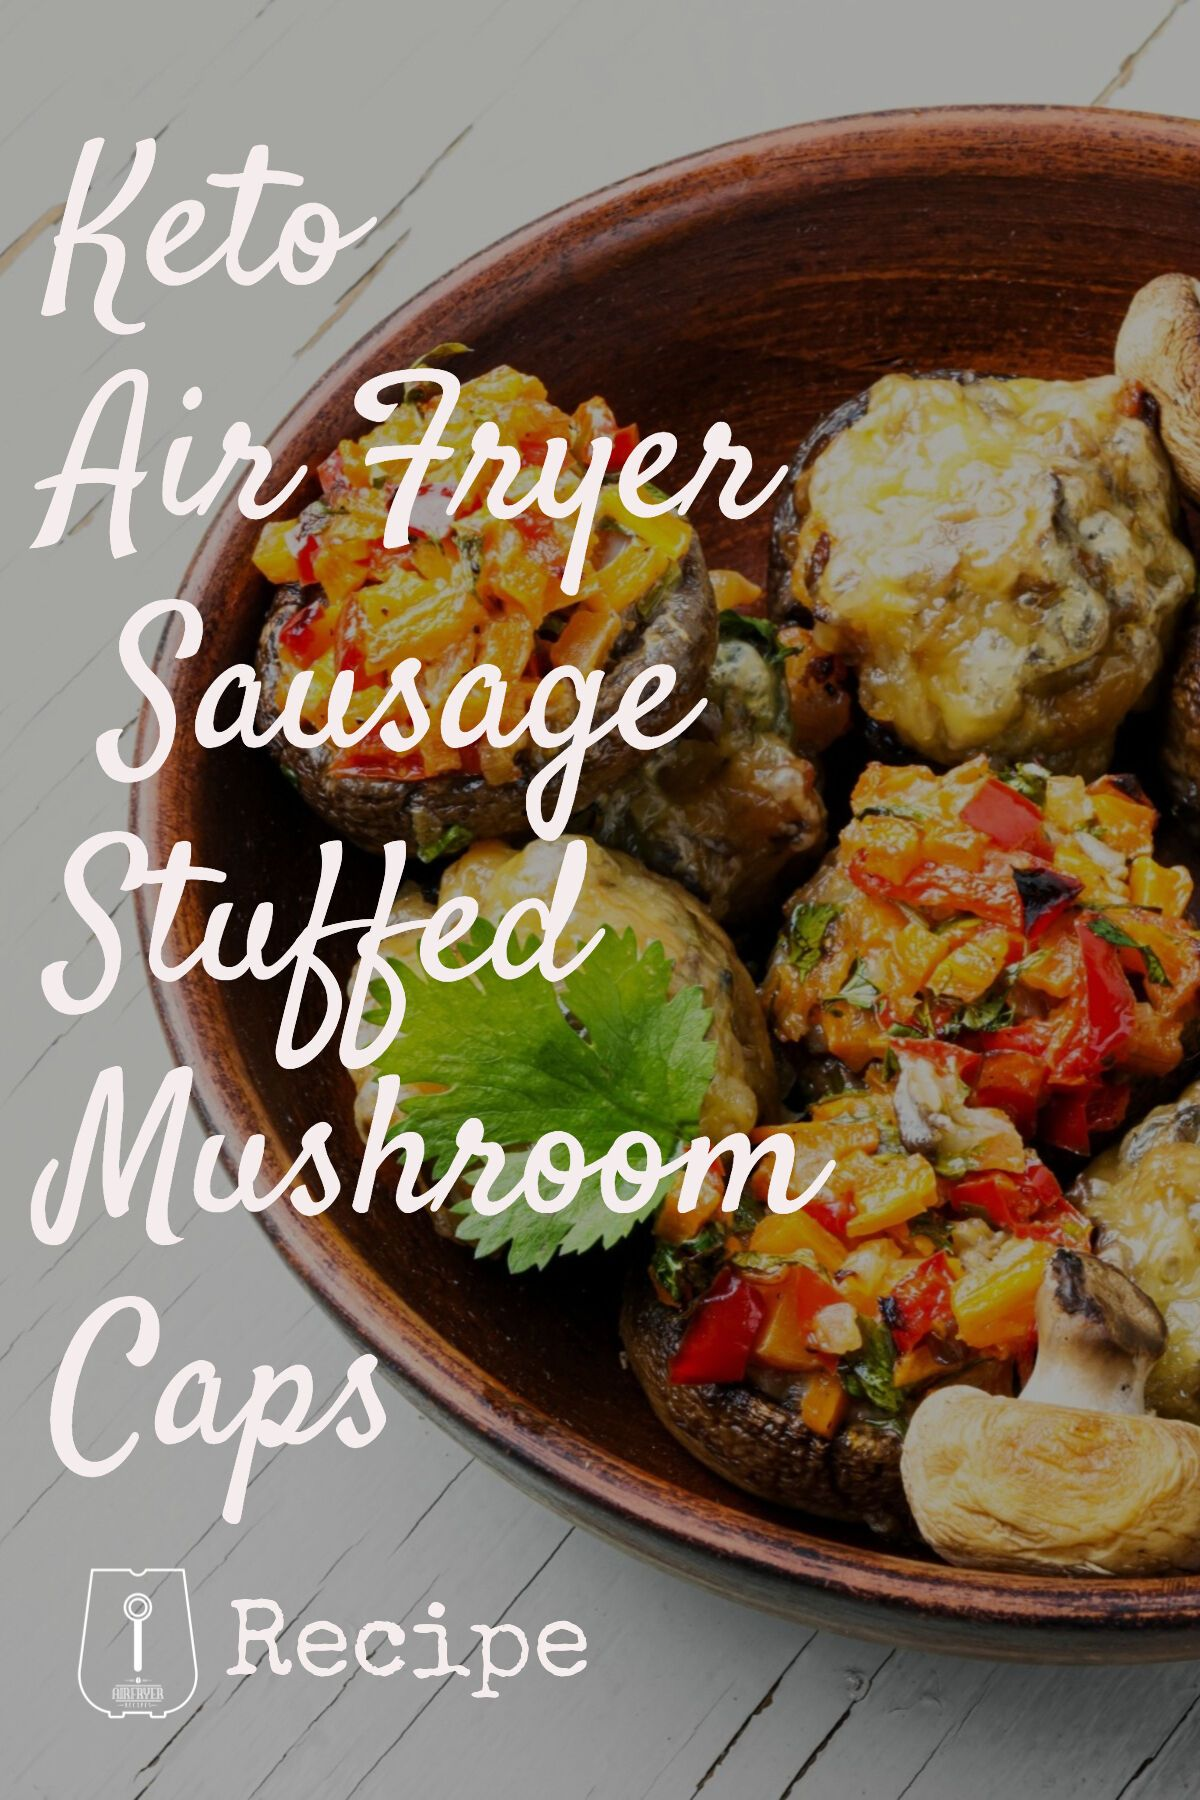 Keto Air Fryer SausageStuffed Mushroom Caps What could